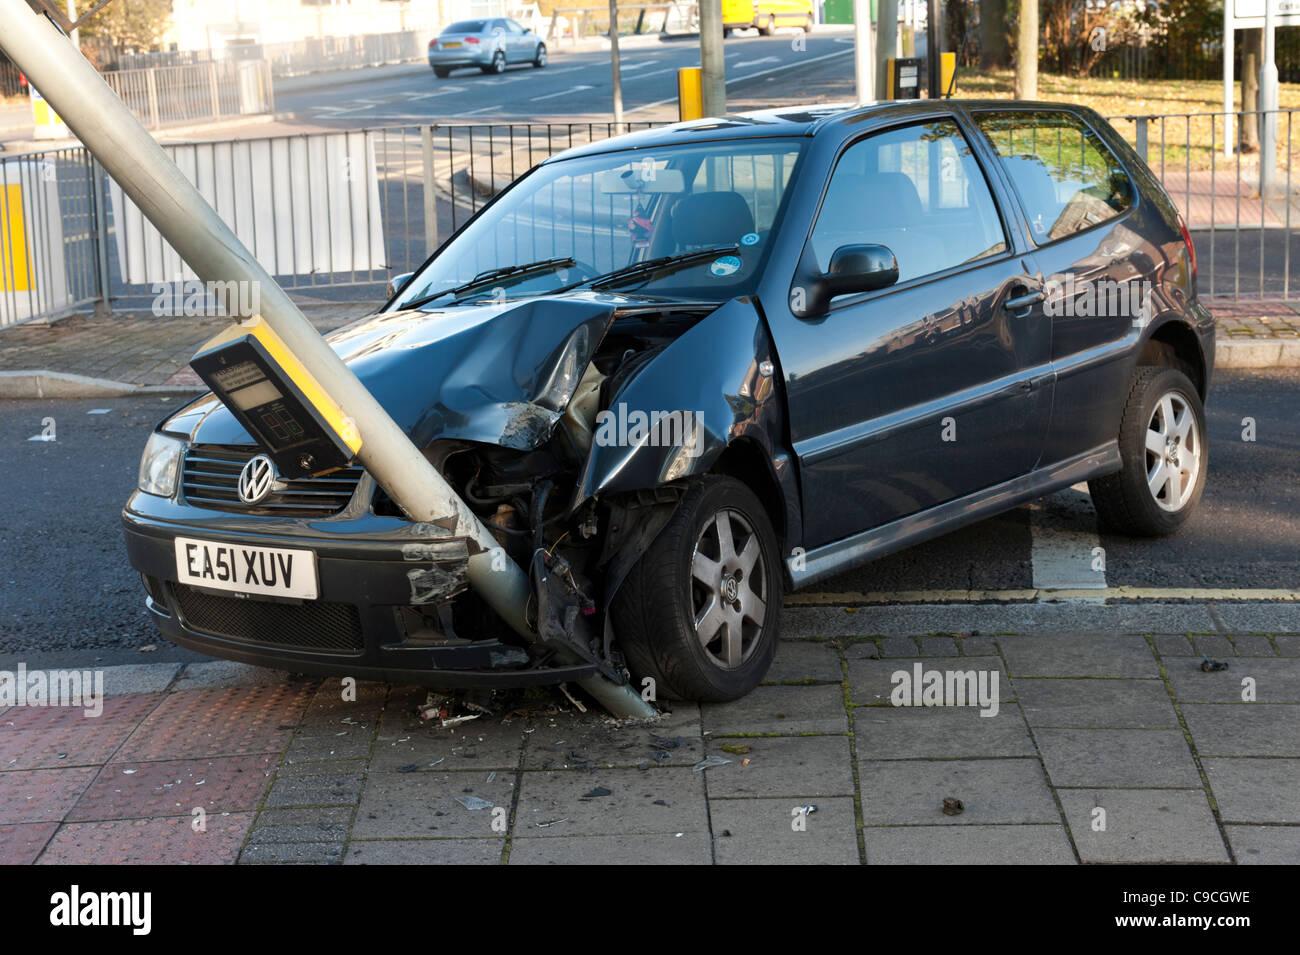 Volkswagen crashed into traffic light, London, England, UK - Stock Image